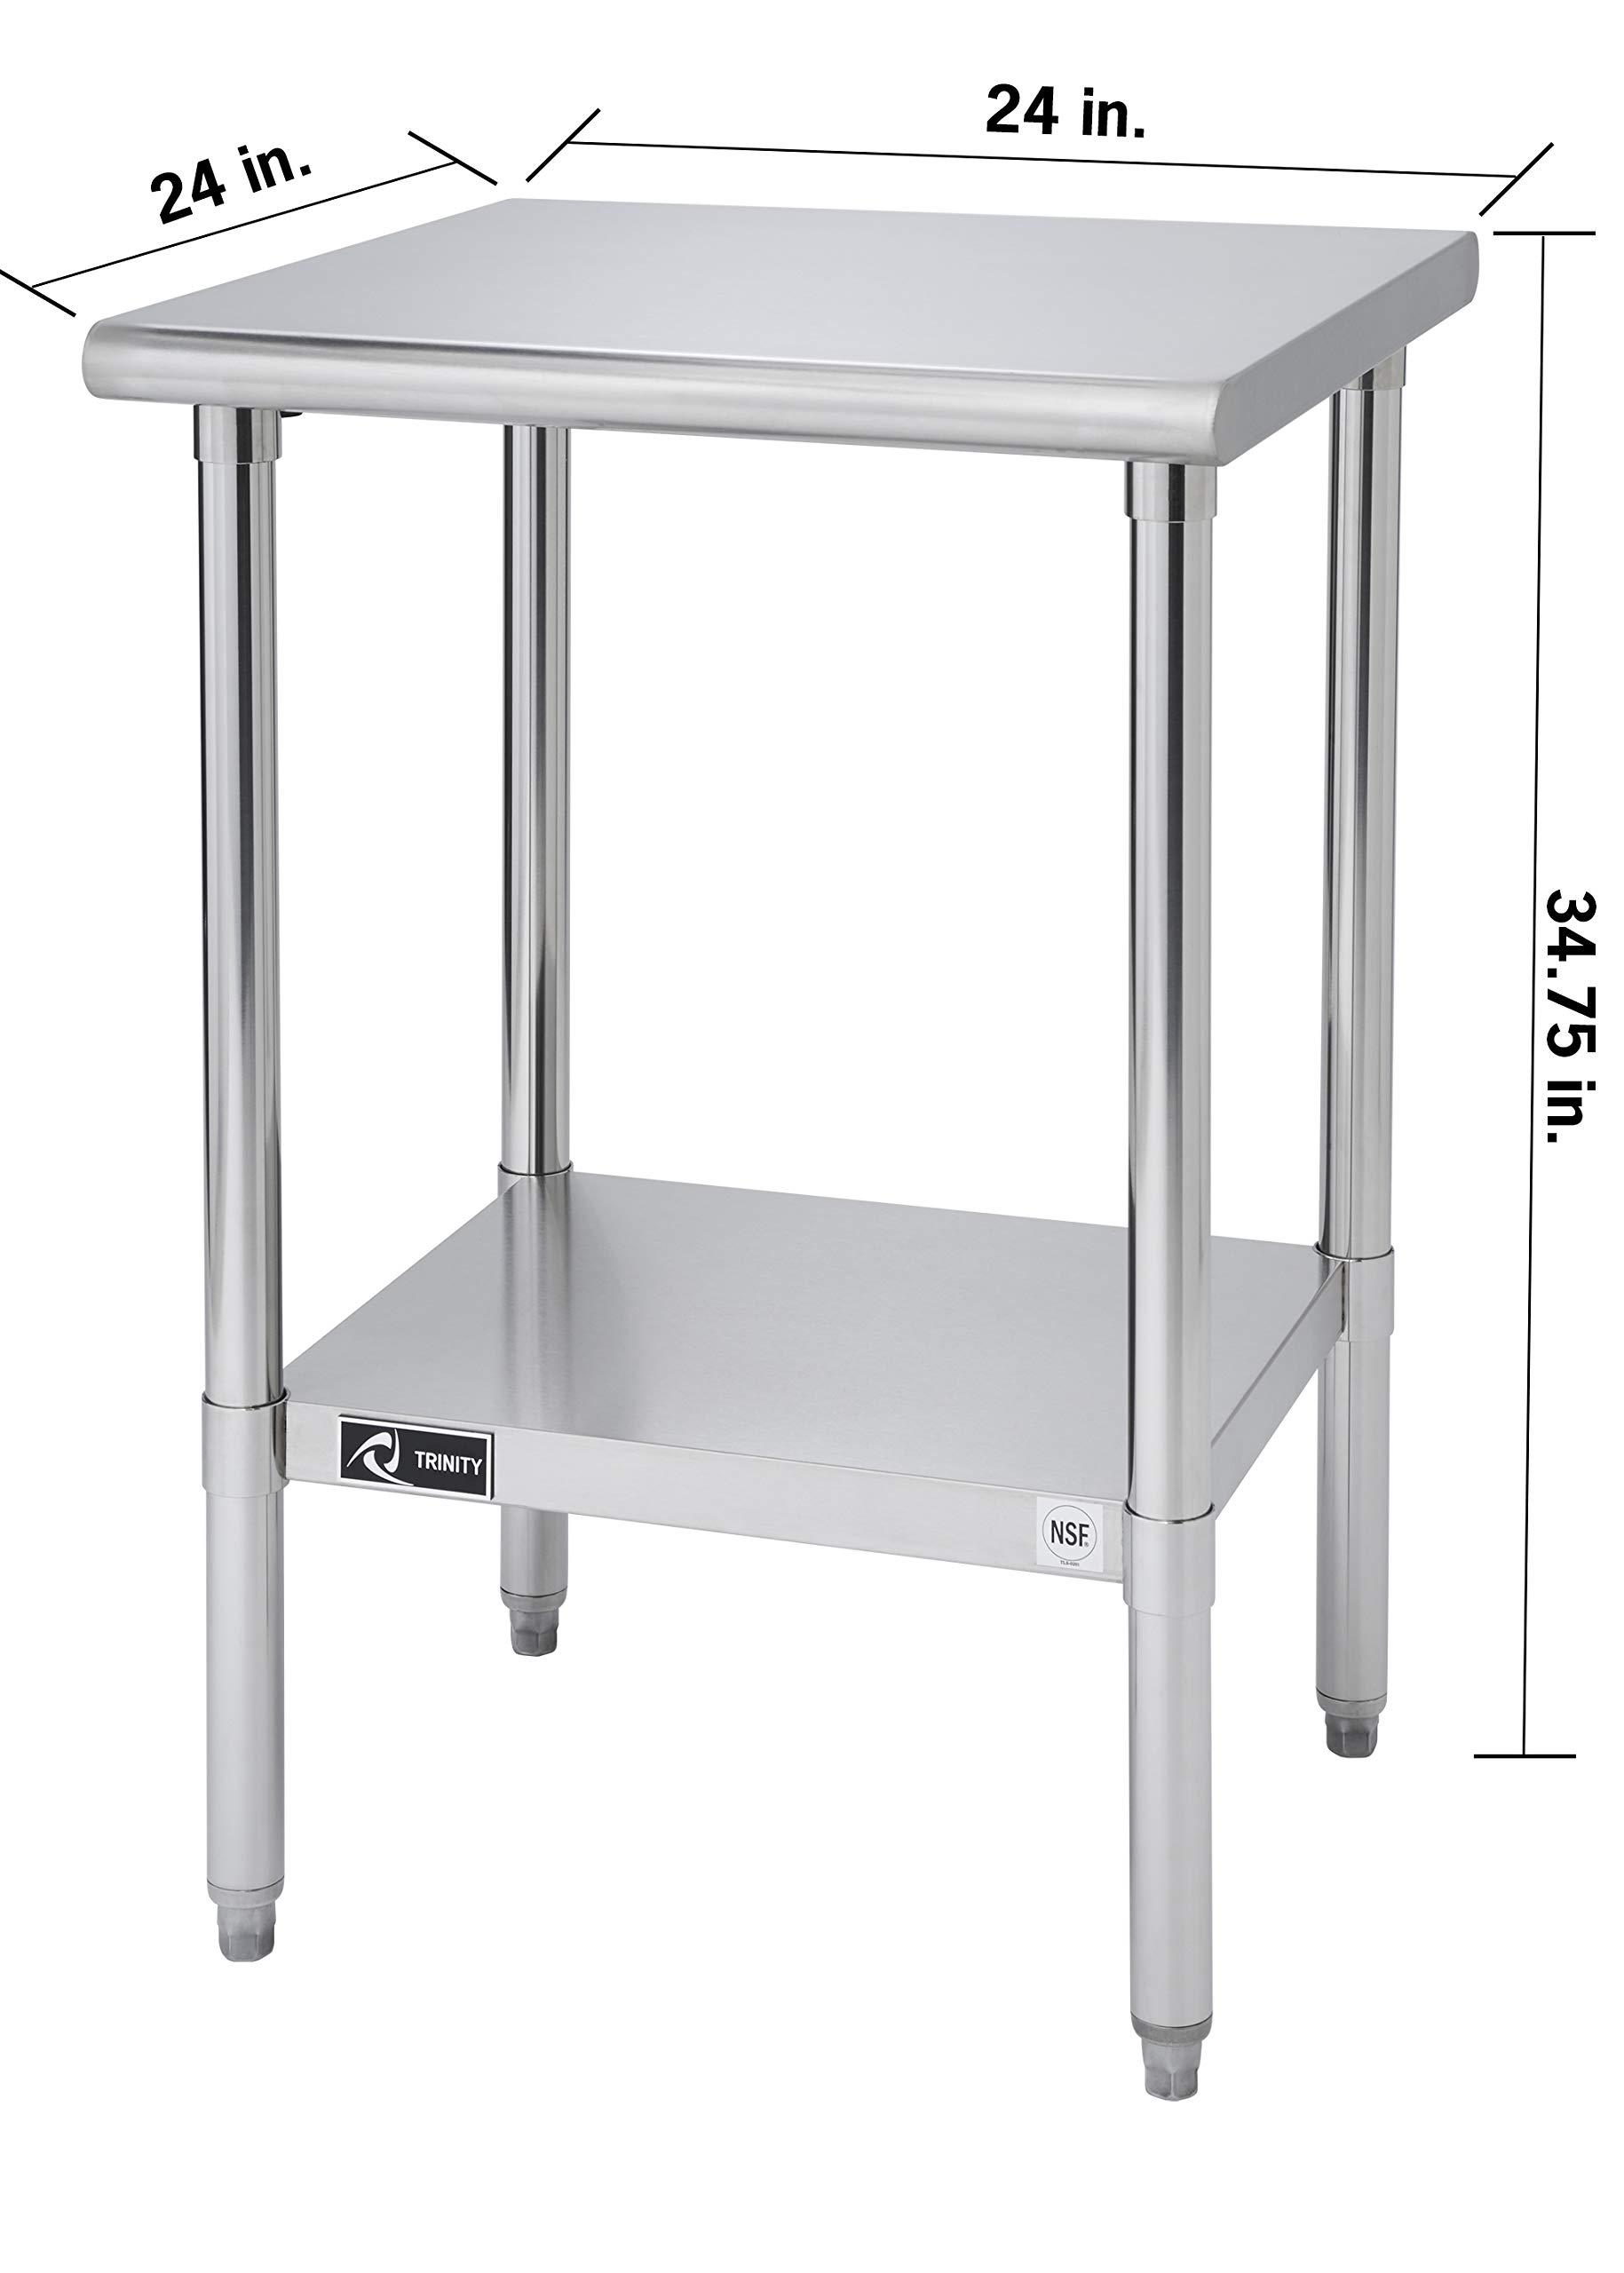 TRINITY EcoStorage NSF Stainless Steel Table, 24-Inch by Trinity (Image #10)